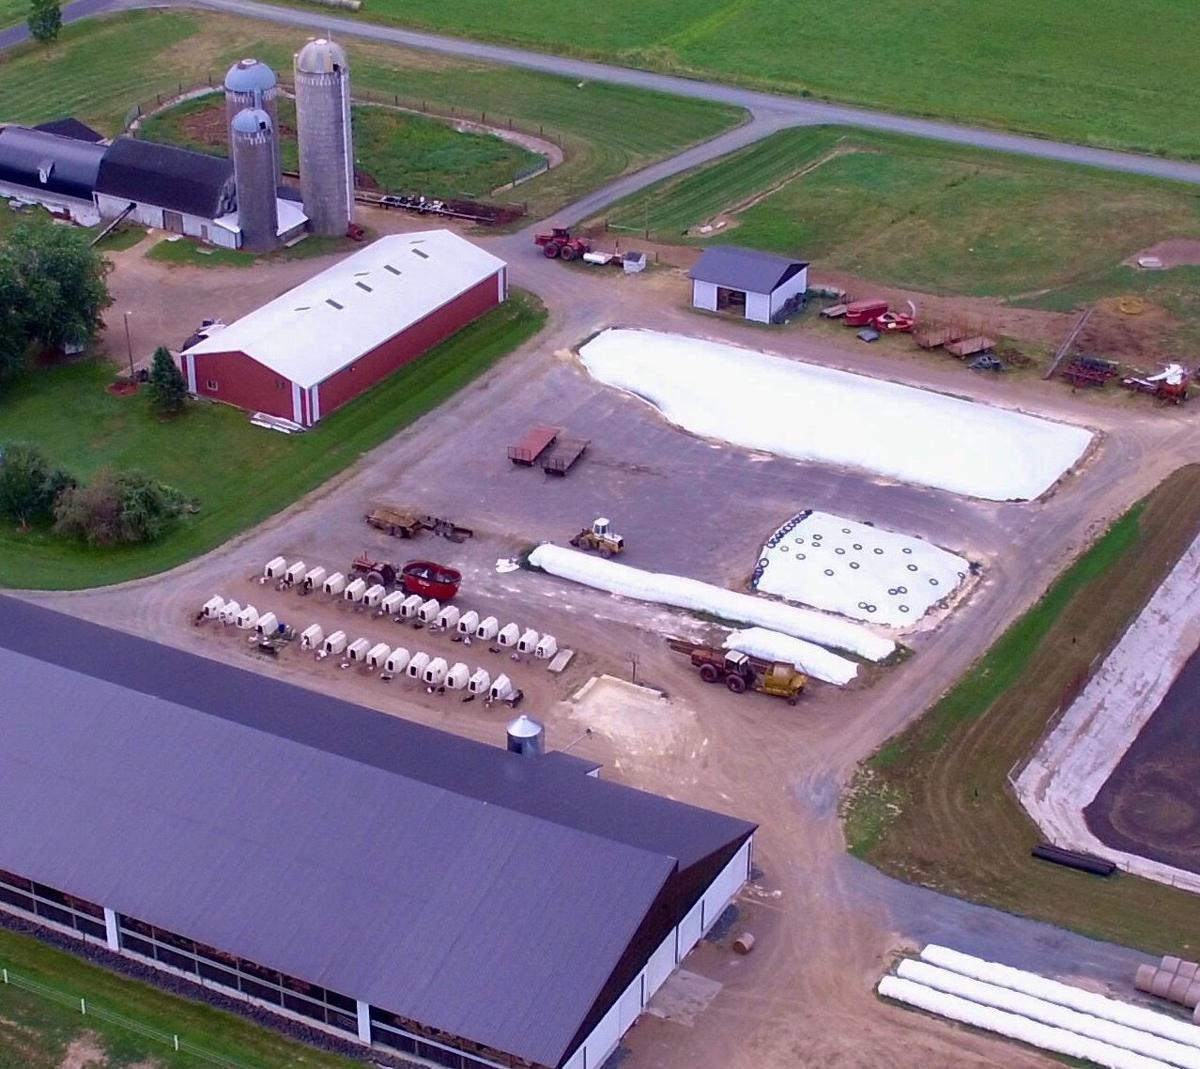 Asphalt feed pad at Ciolkosz Dairy